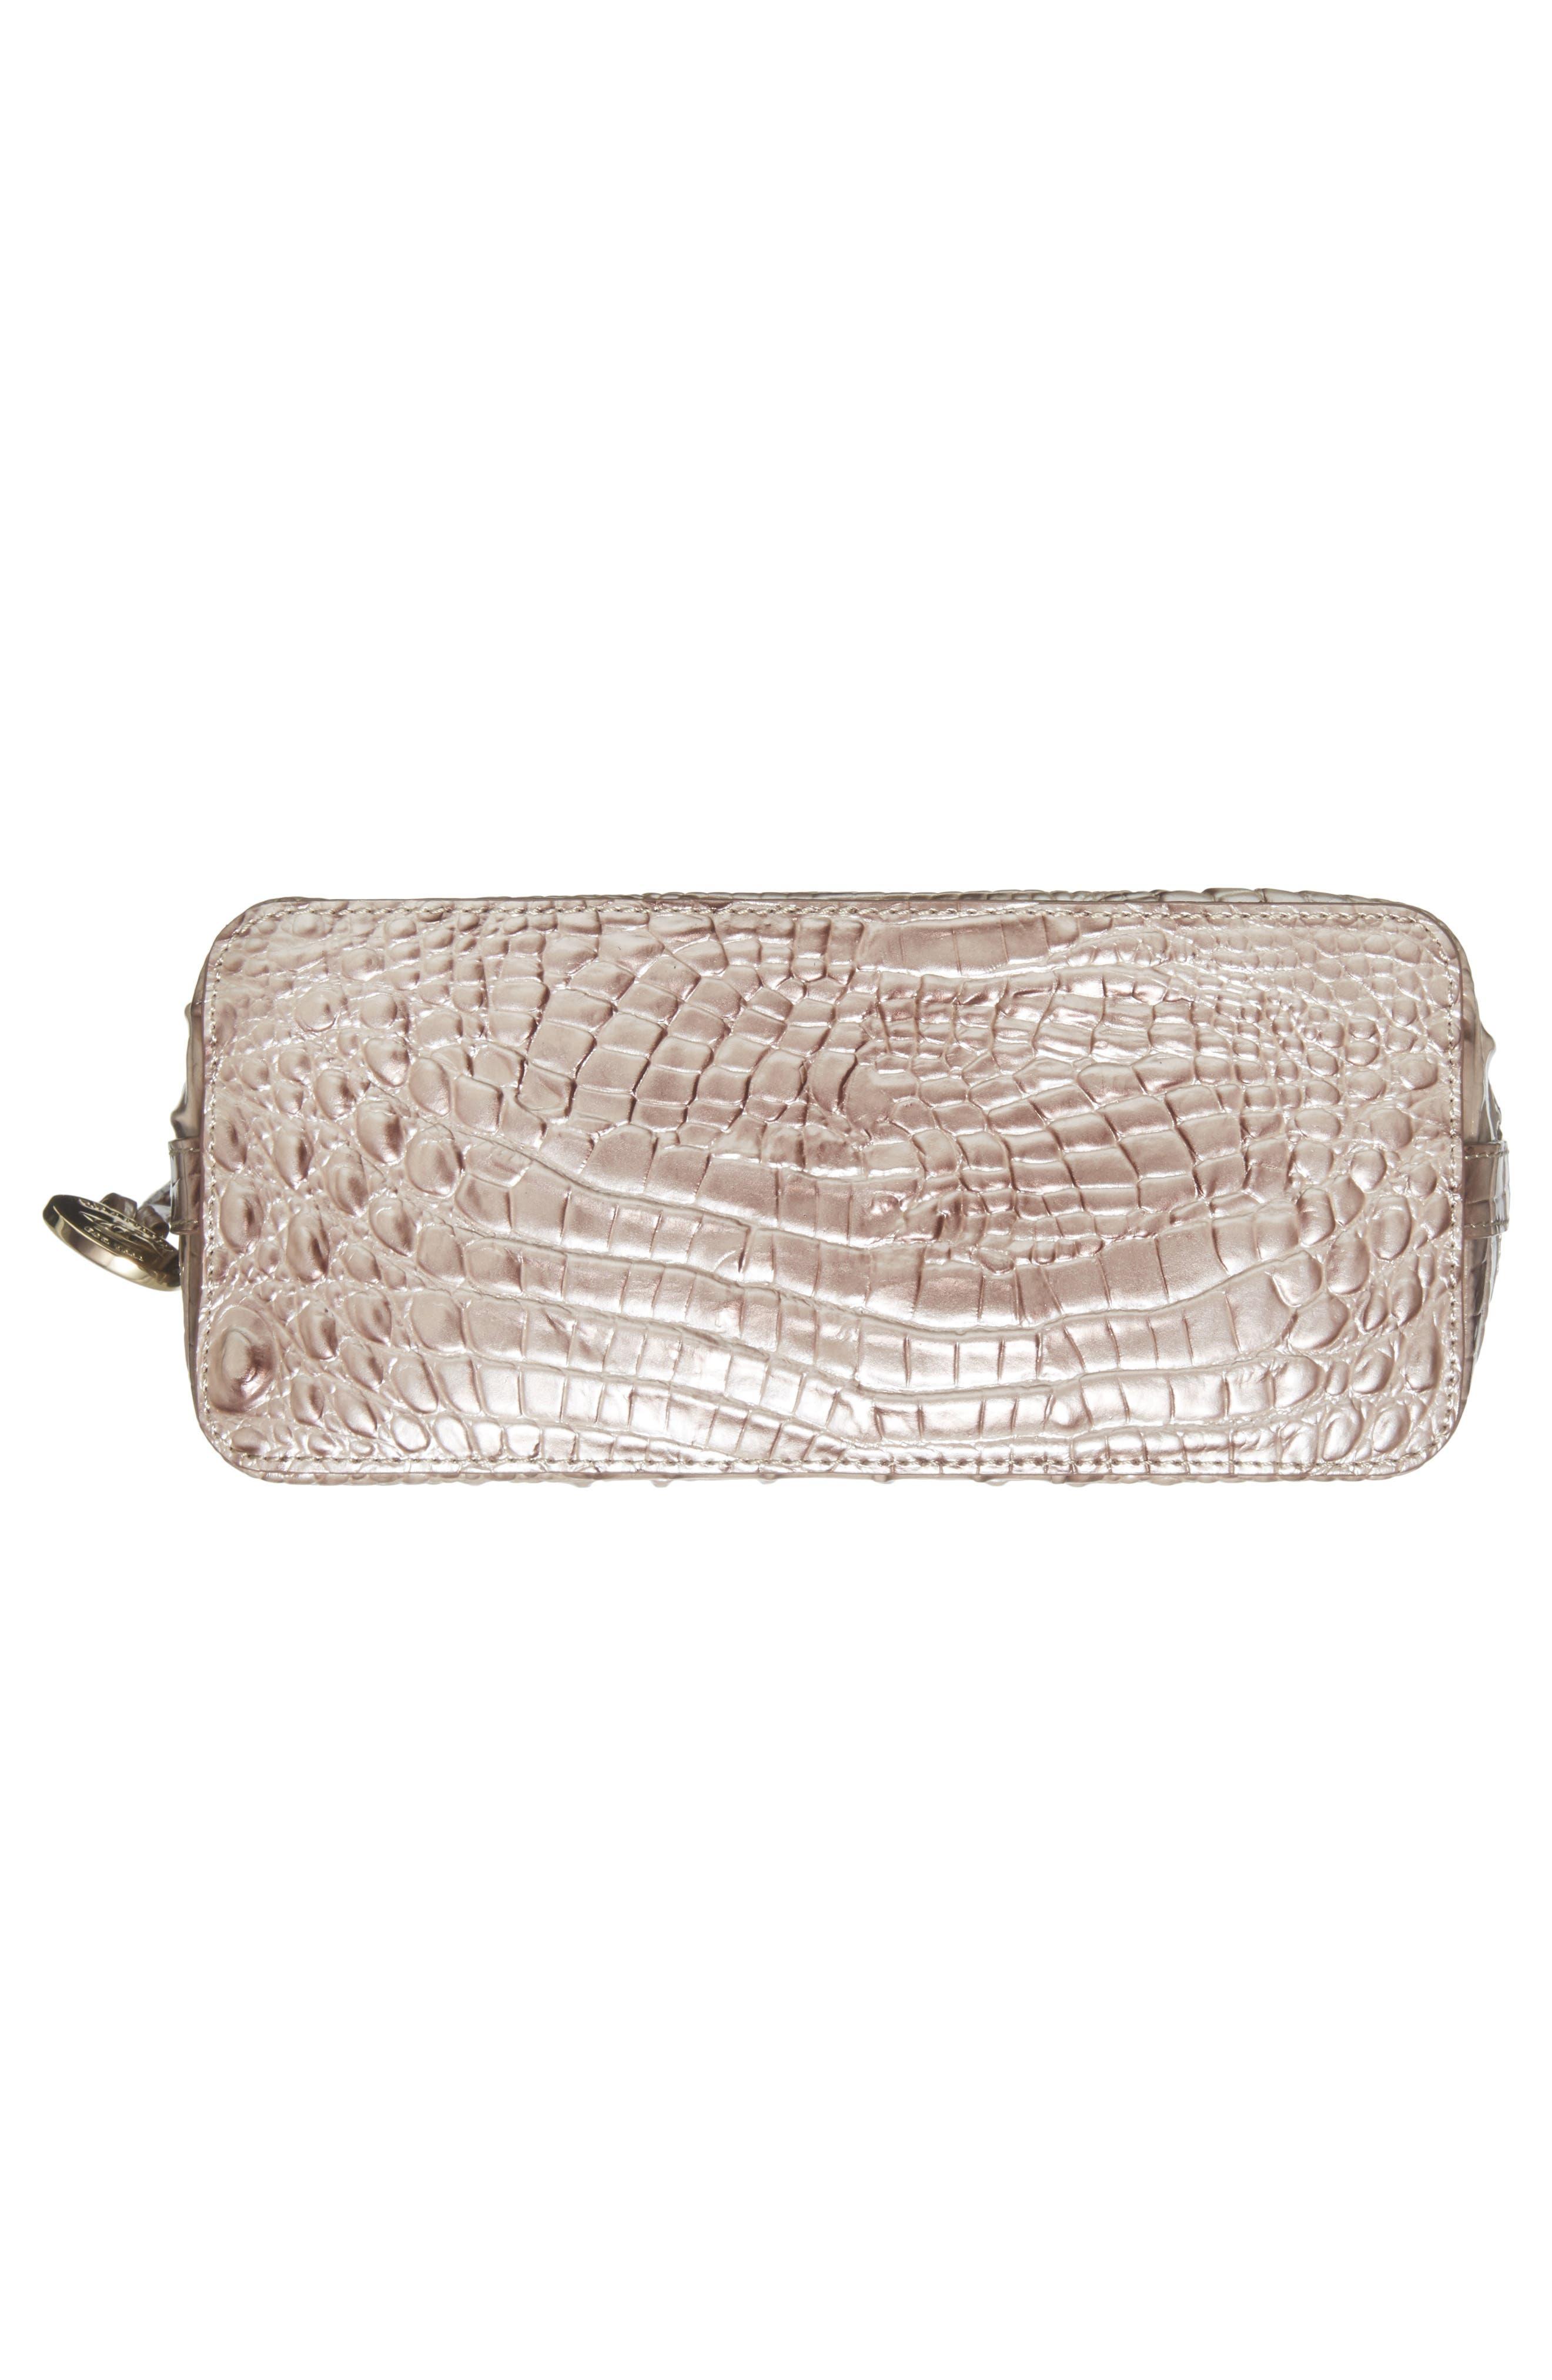 Mini Duxbury Leather Crossbody Bag,                             Alternate thumbnail 6, color,                             210